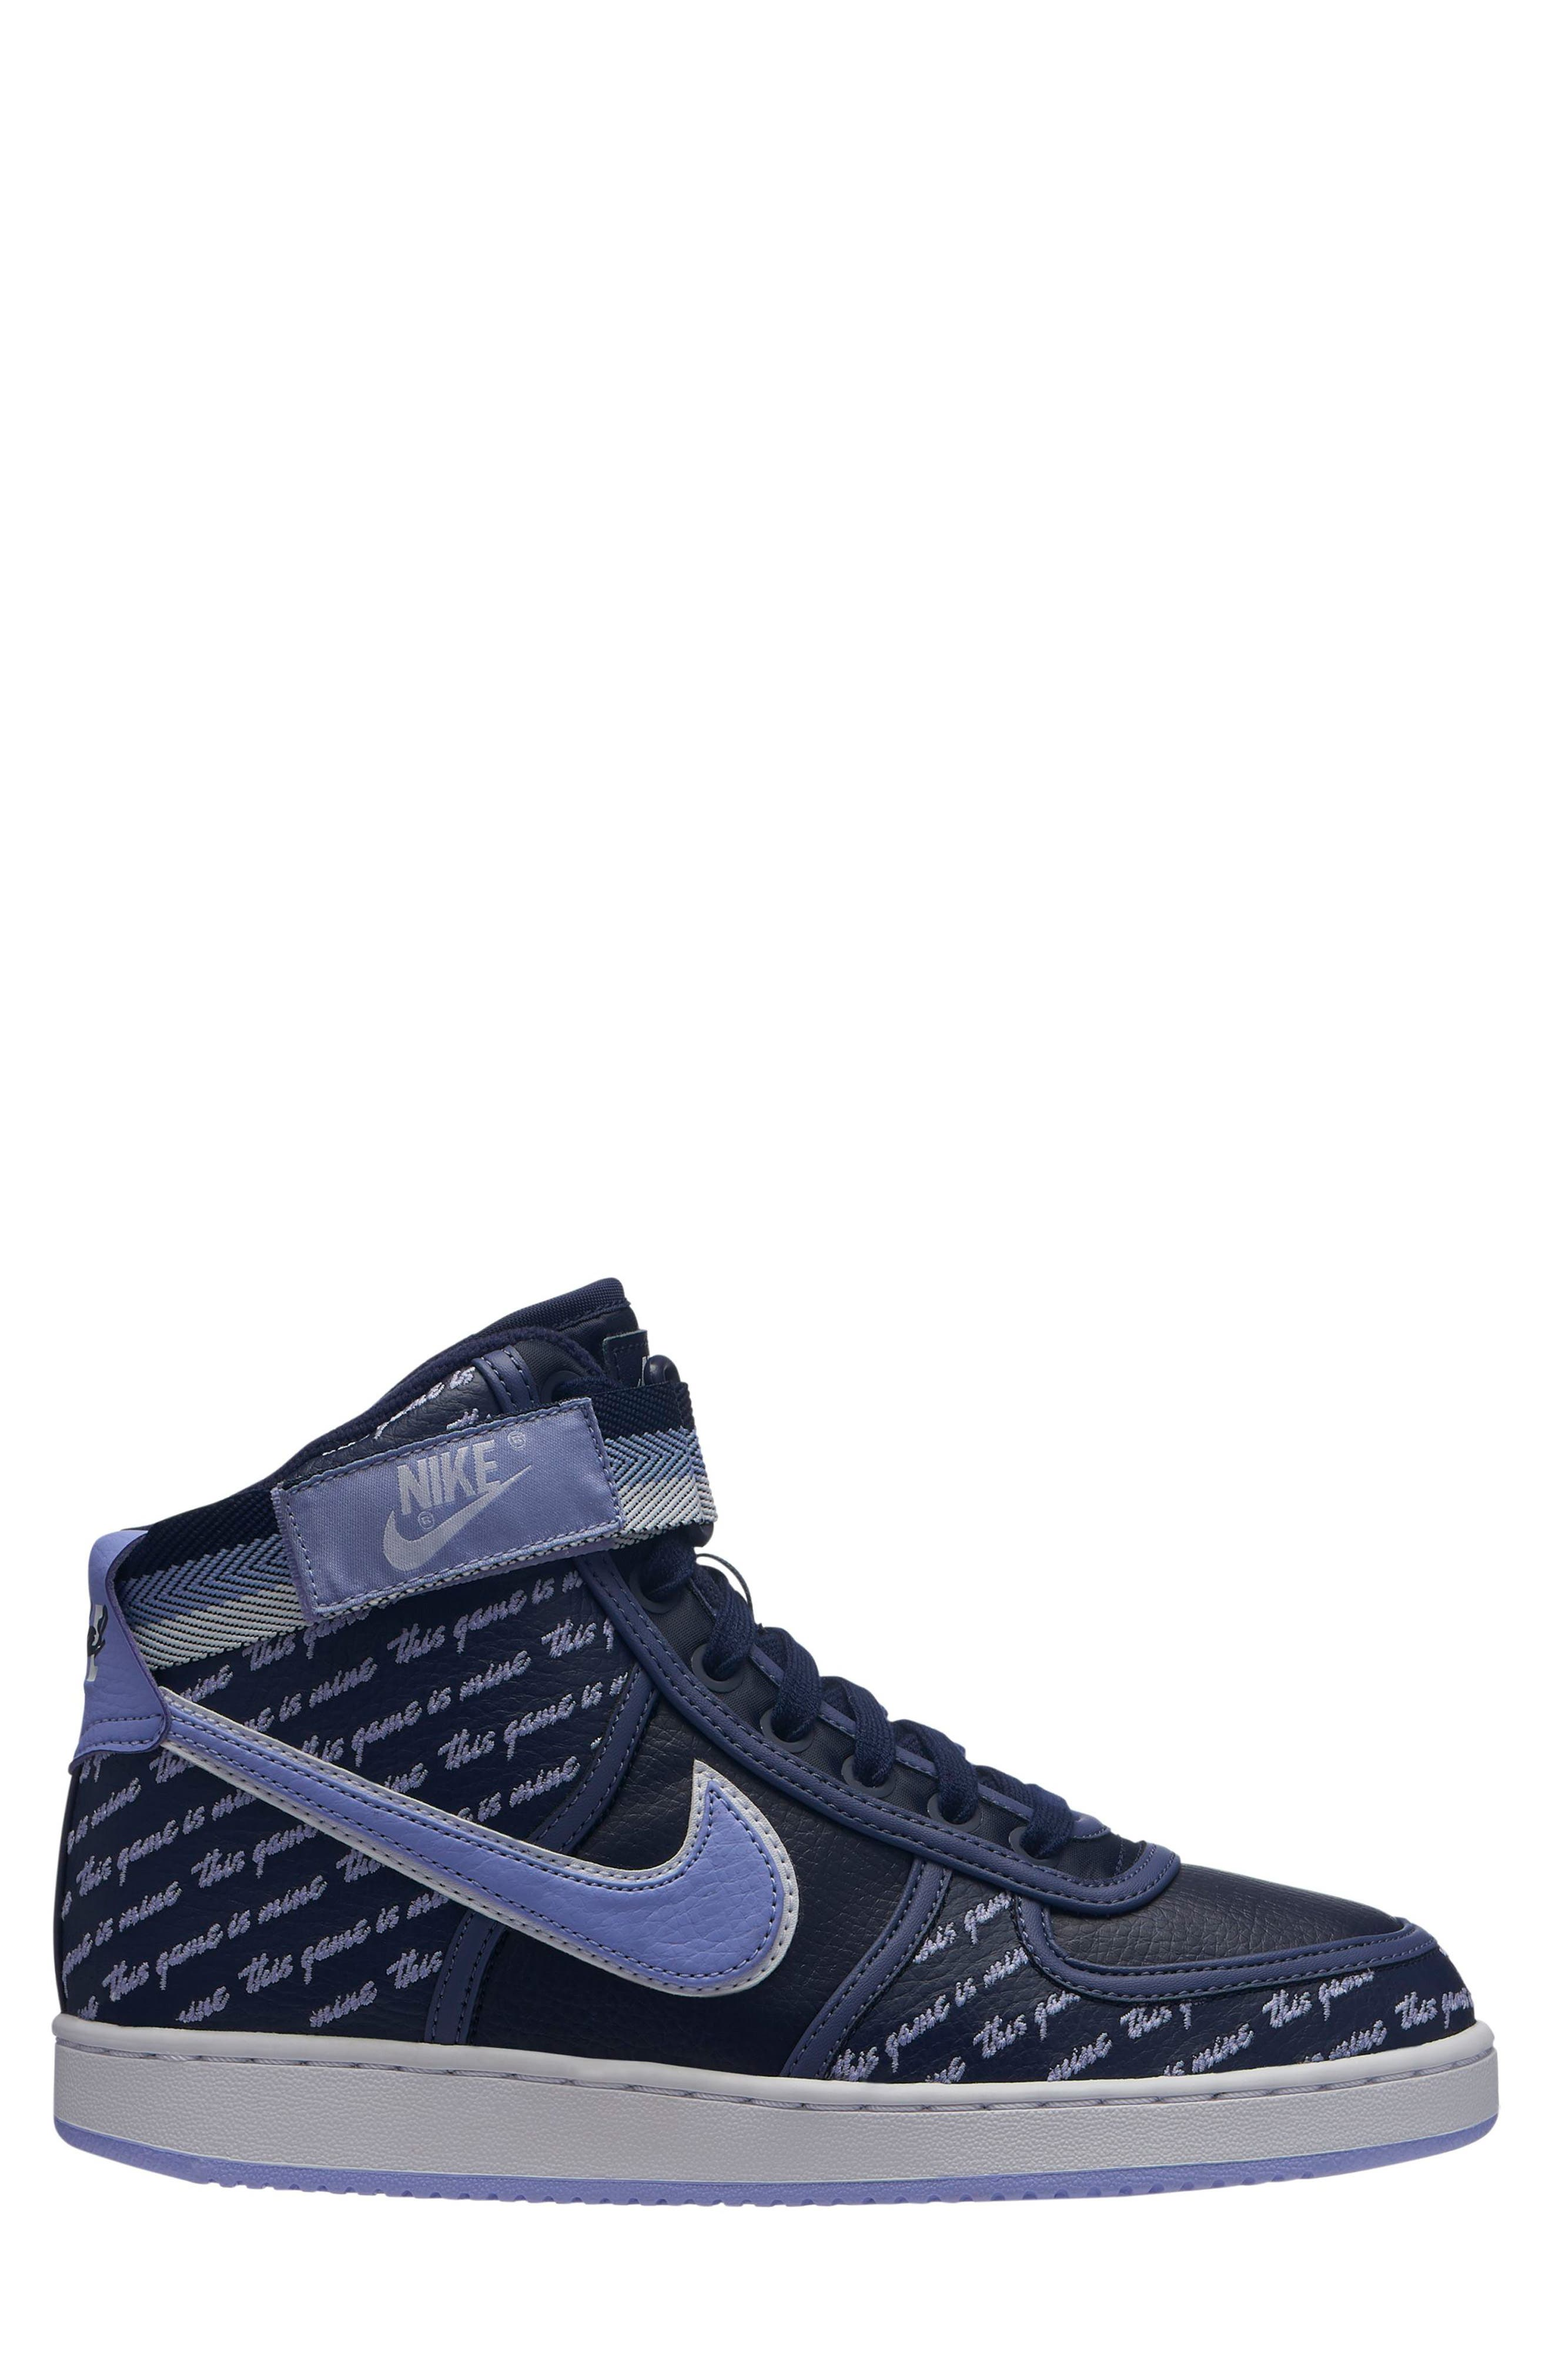 NIKE, Vandal High Lux Sneaker, Main thumbnail 1, color, 401